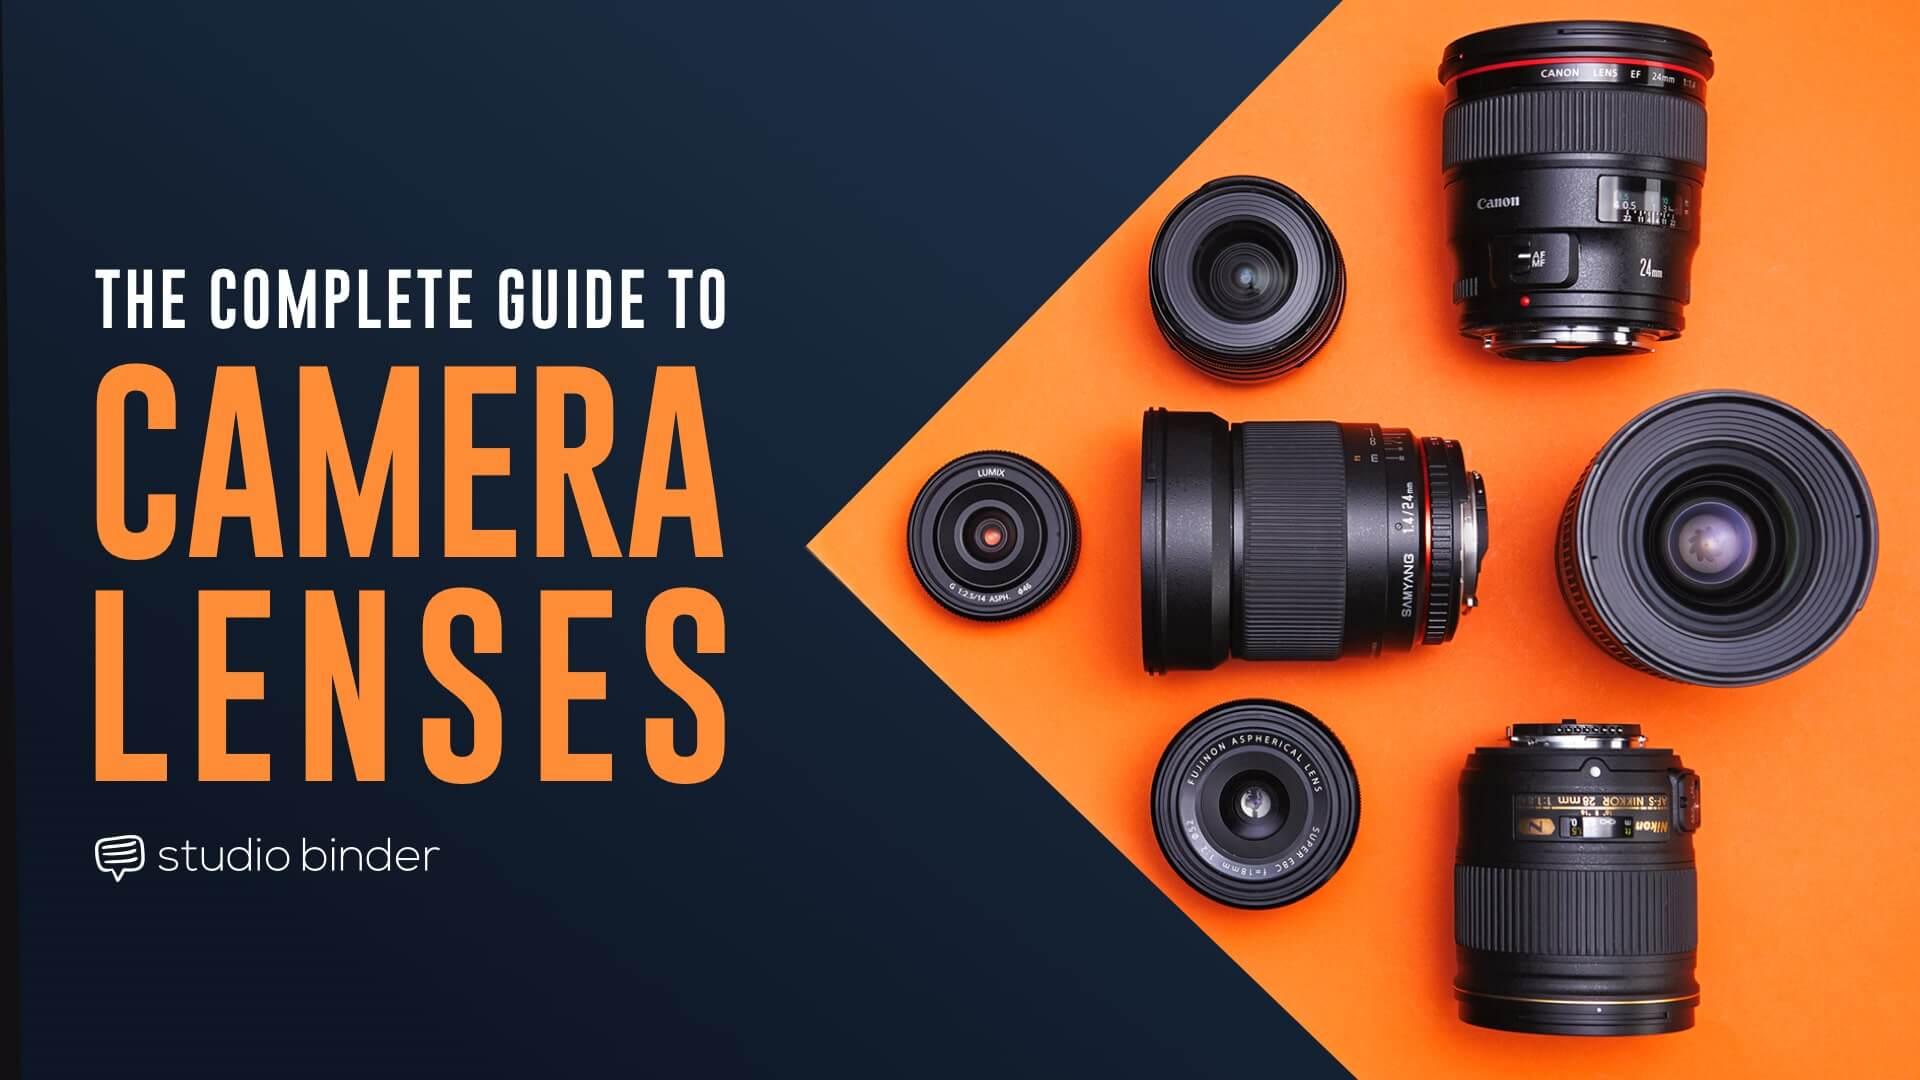 lens basics understanding camera lenses - HD1920×1080